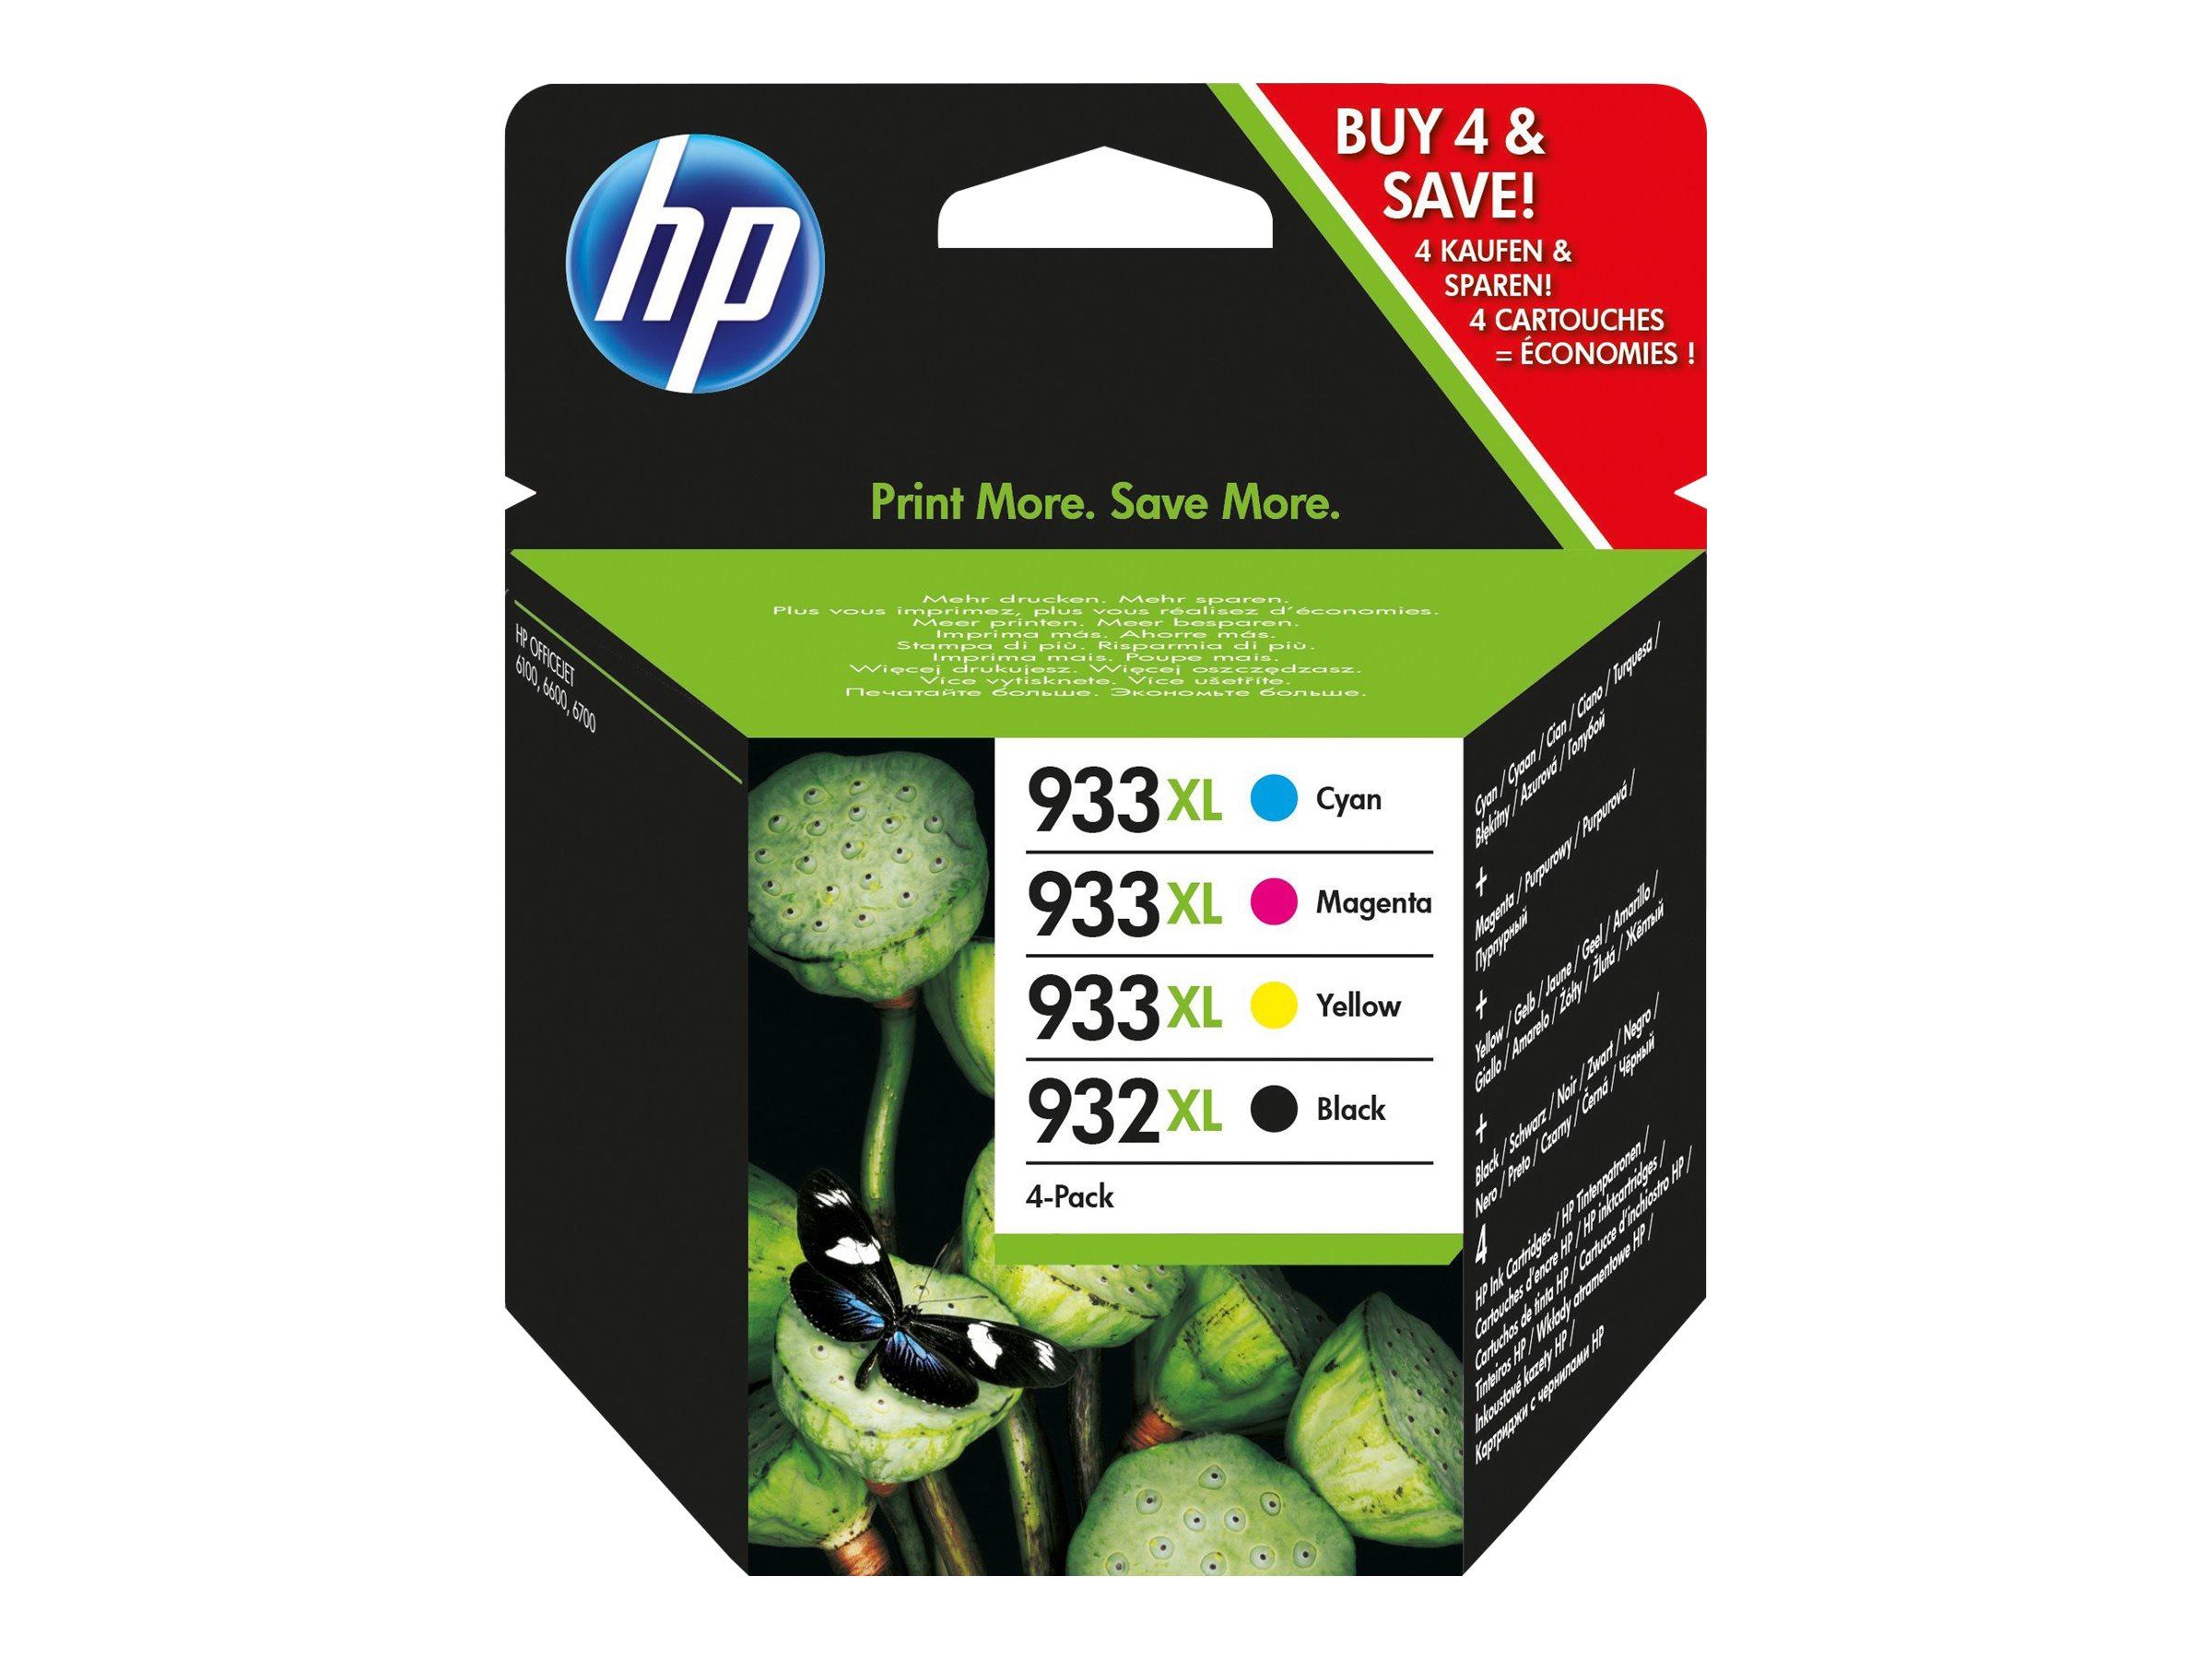 HP 932/933 Combo Pack - 4er-Pack - Schwarz, Gelb, Cyan, Magenta